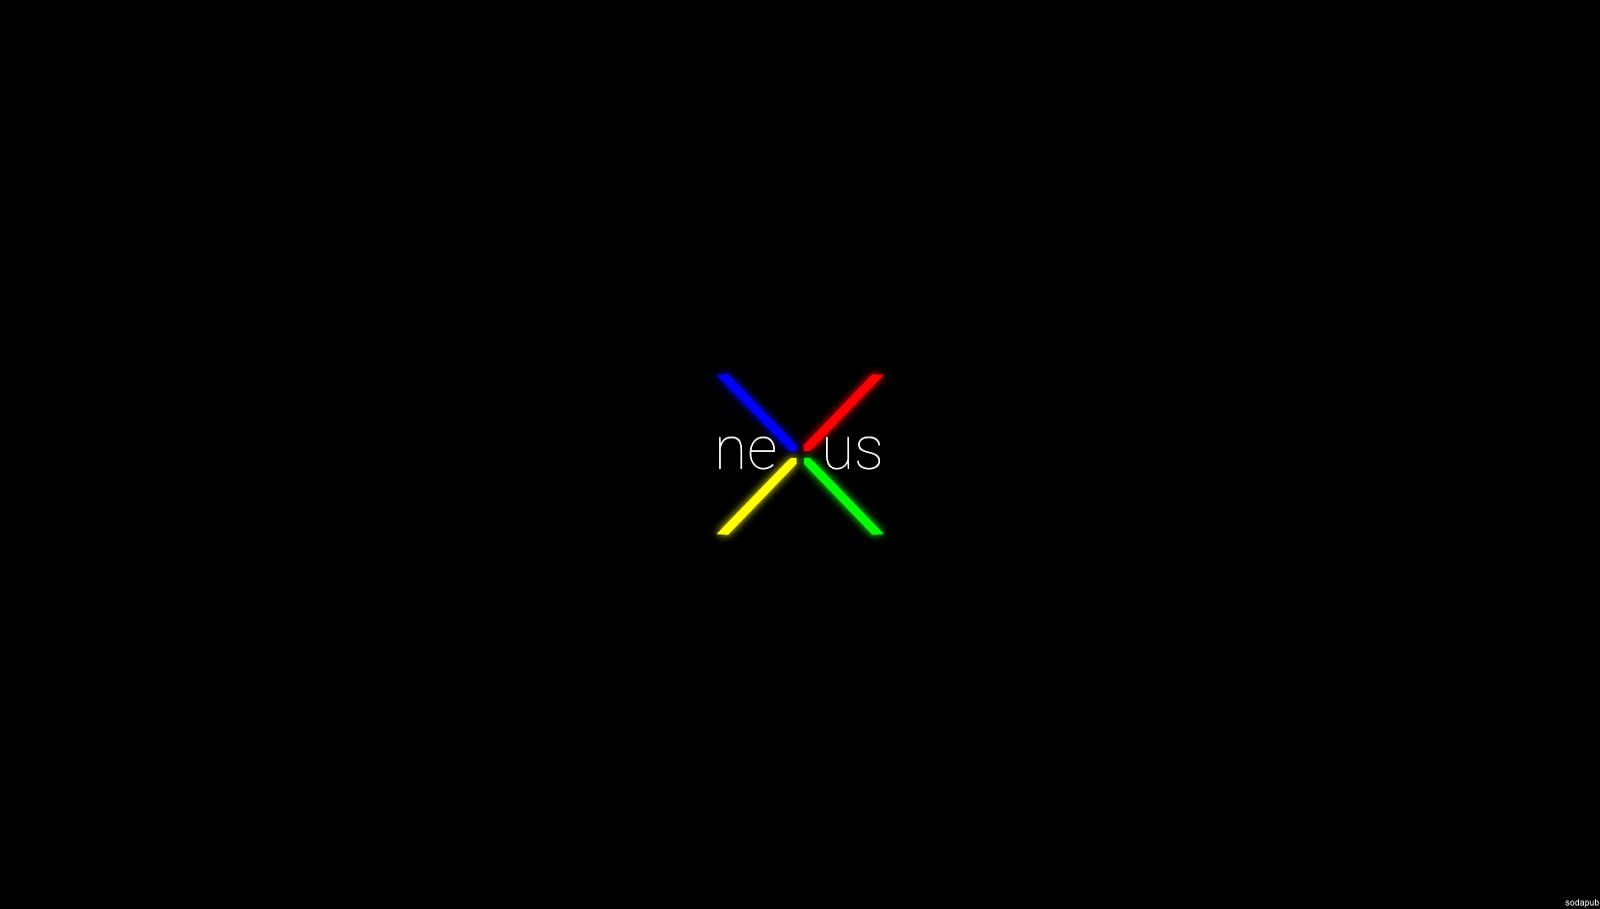 Galaxy Nexus 4 Wallpaper   Unduh Wallpapers